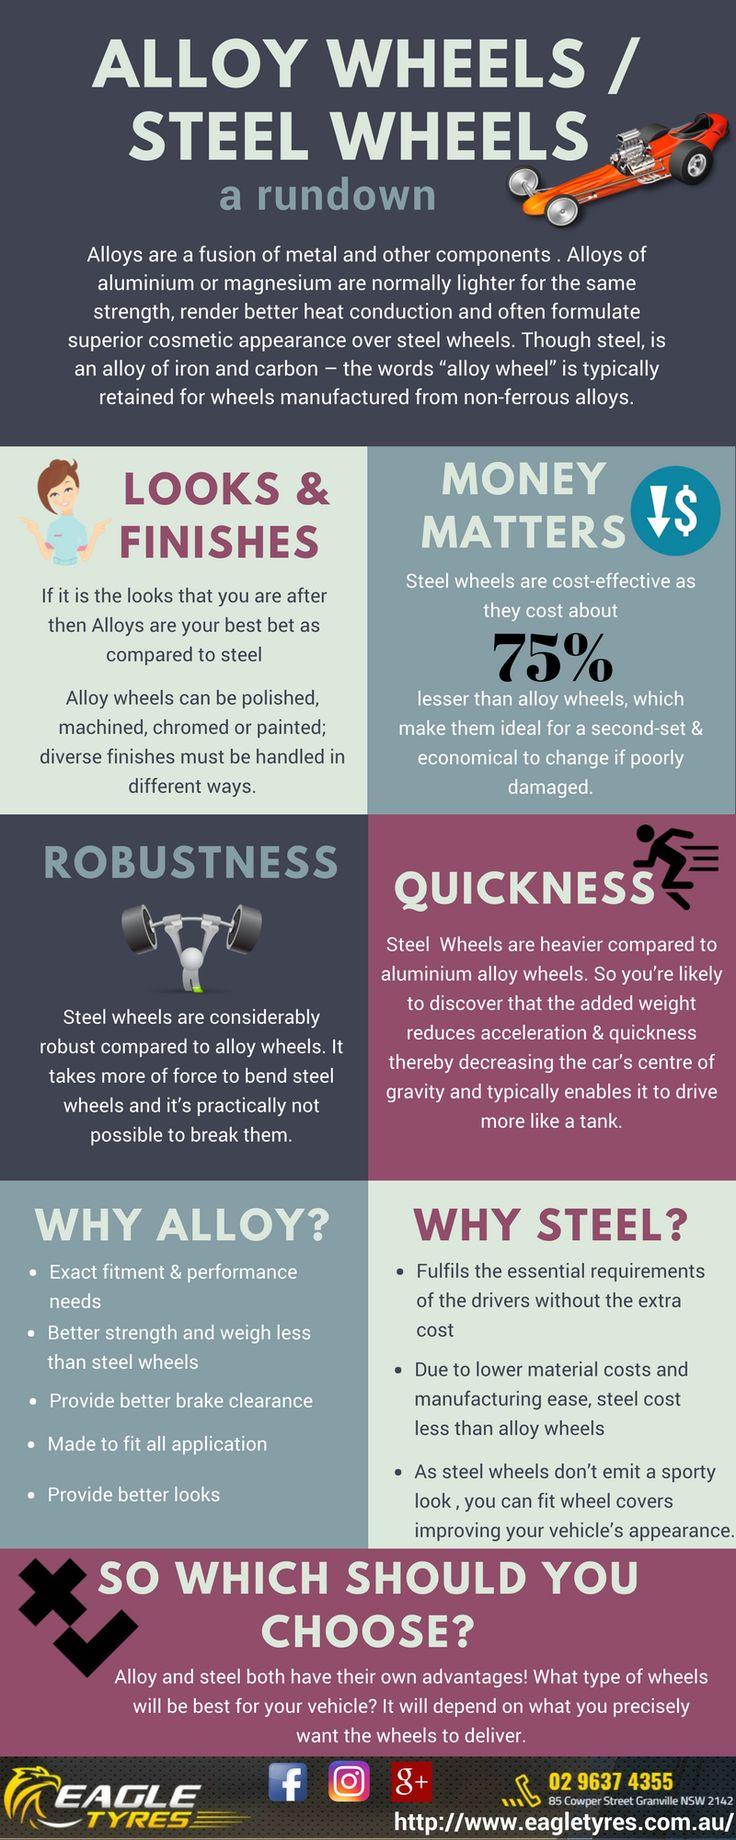 #infographic #alloy #steel #wheels #alloywheelsonline #alloywheelssydney #wheeldealers #wheelssydney #wheelpackages #wheelsandtyrespackages #wheelshopsydney